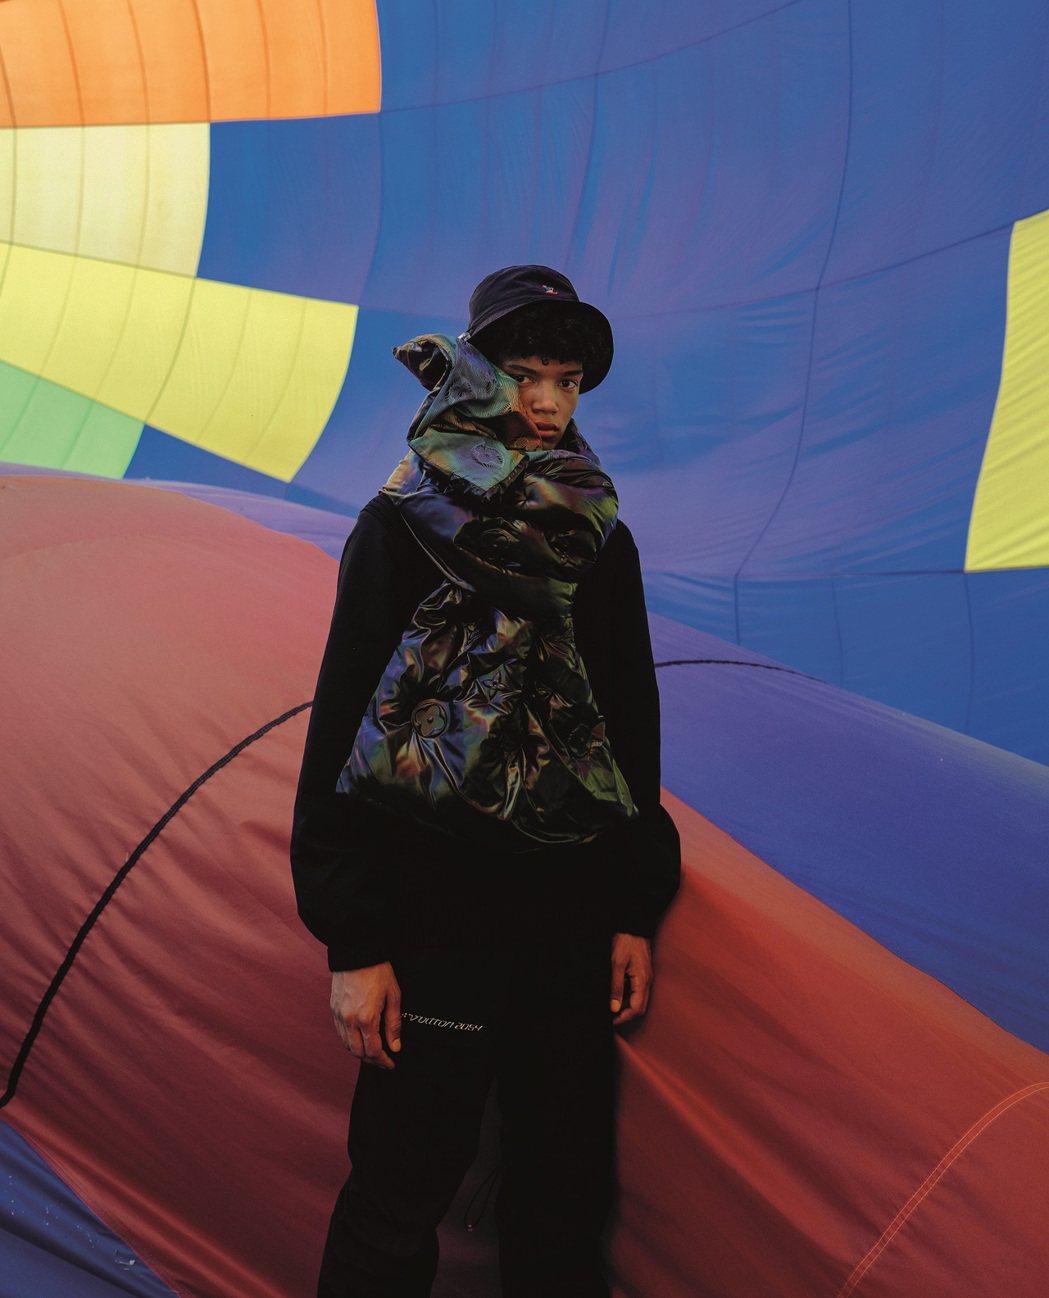 LV 2054系列的羽絨圍巾正反面分別是壓印monogram、綁染風格彩虹圖紋。...